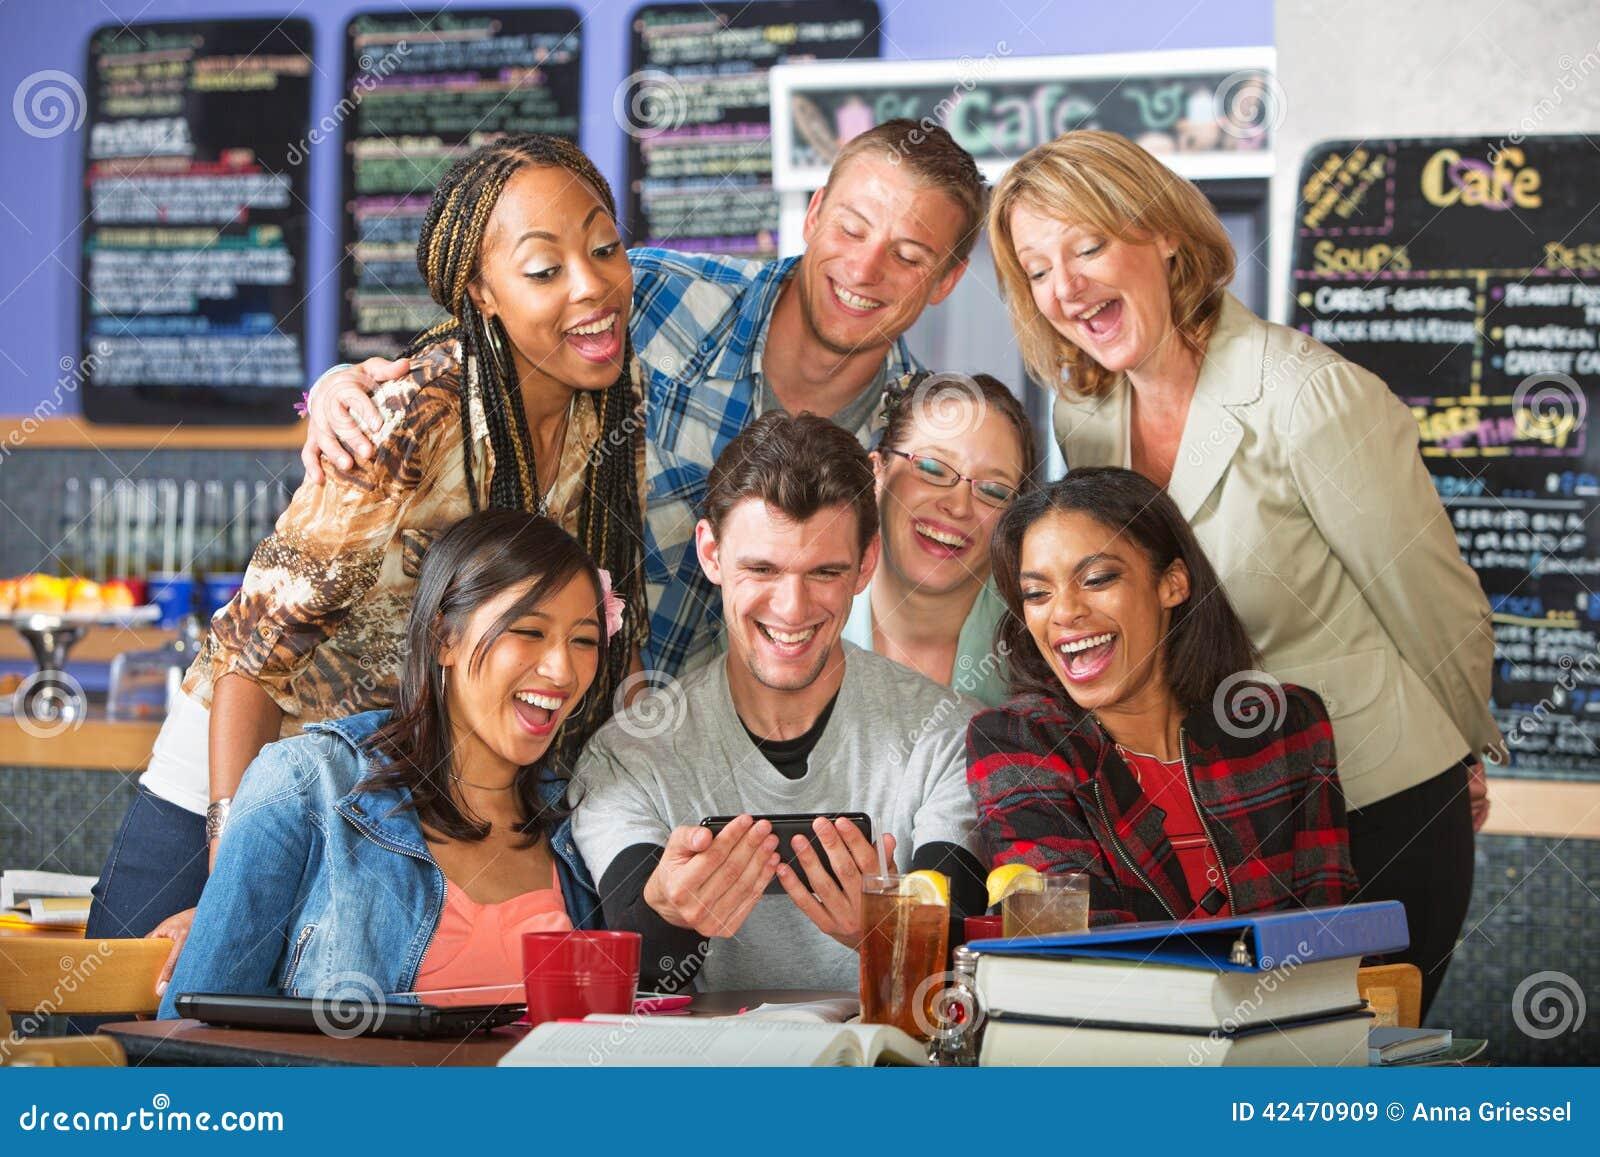 Lächelnde Studenten mit Kamera-Telefon